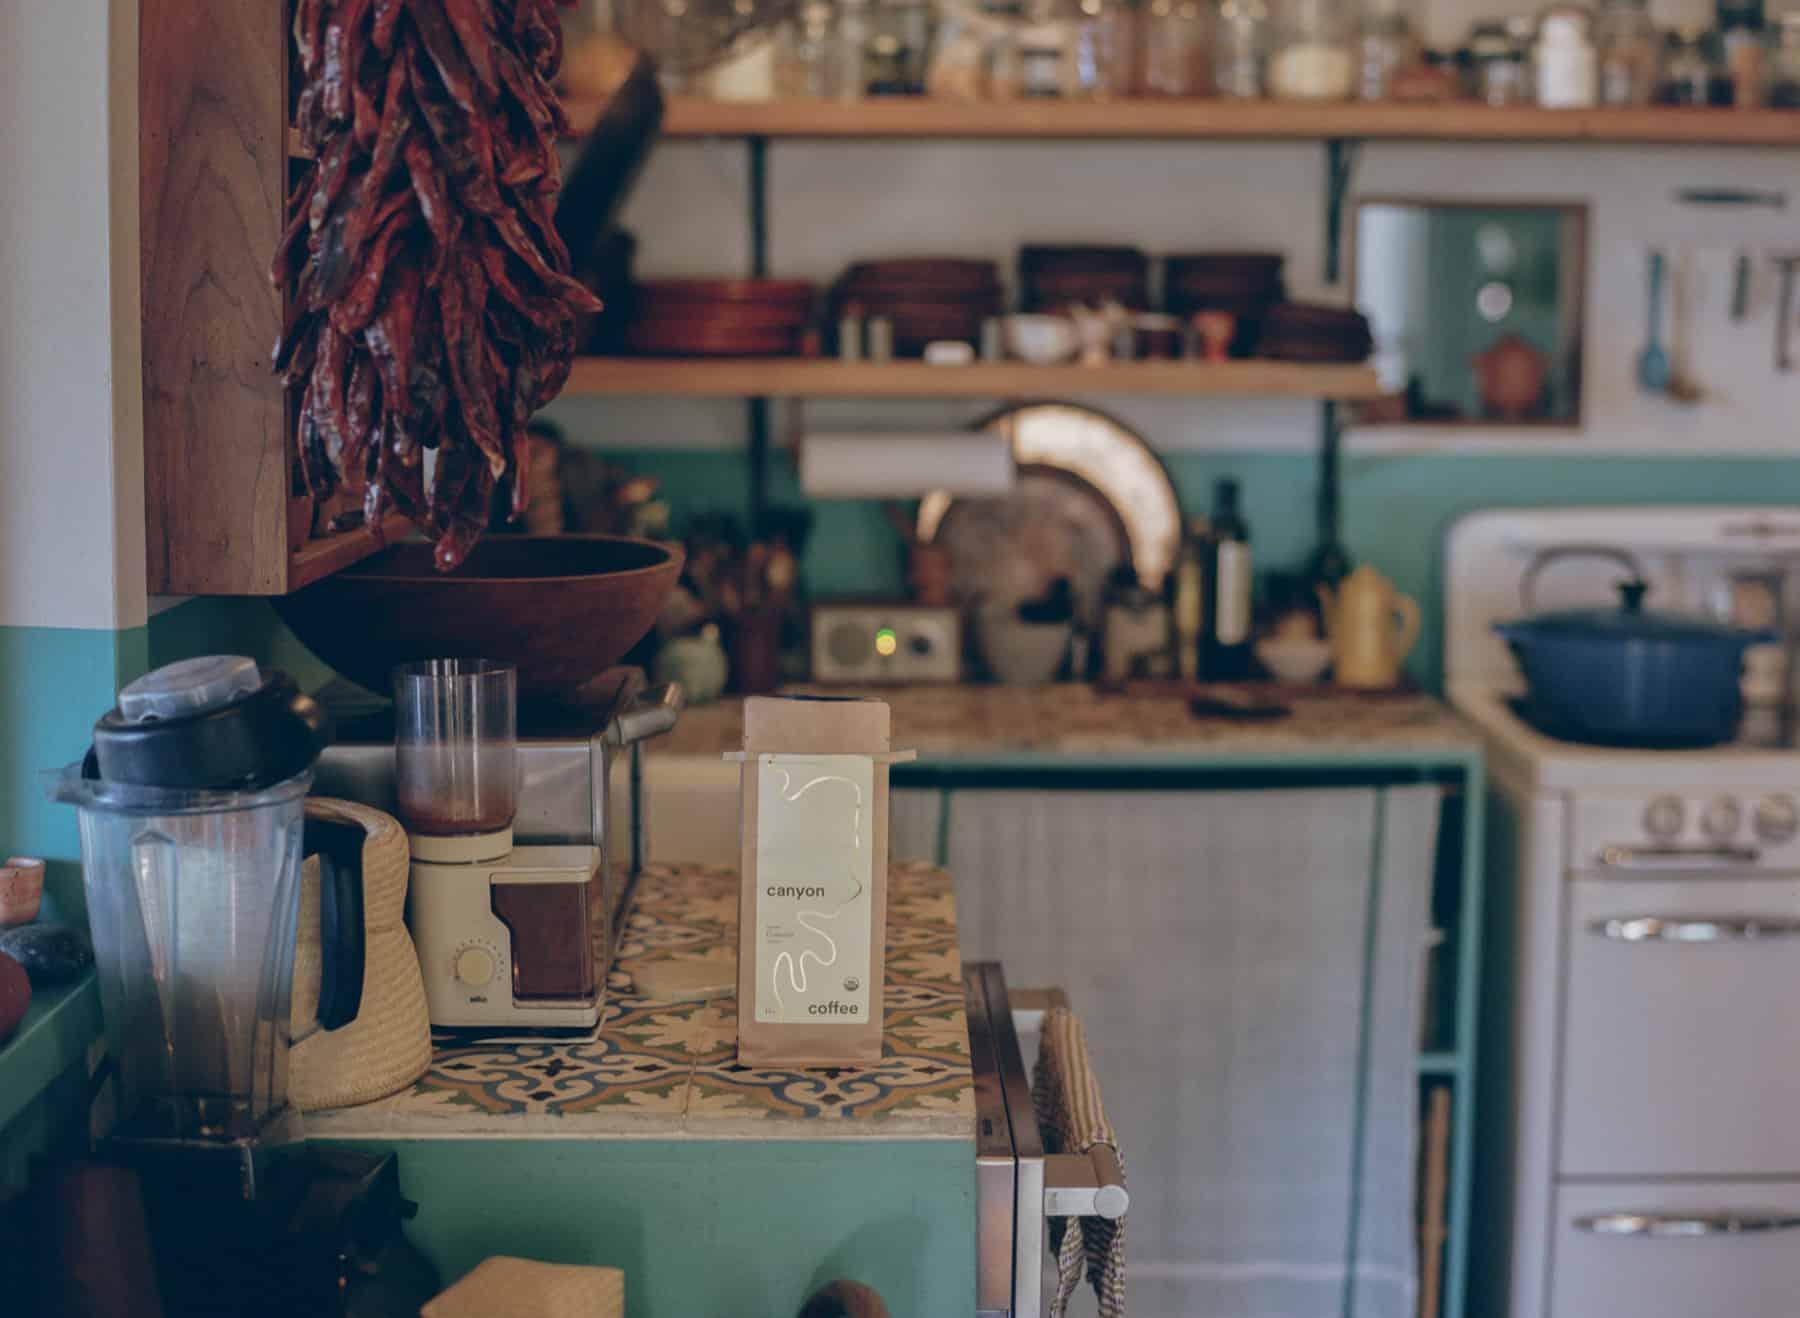 Beatrice Valenzuela, Canyon Coffee, Casey Wojtalewicz. Ally Walsh, Justin Chung